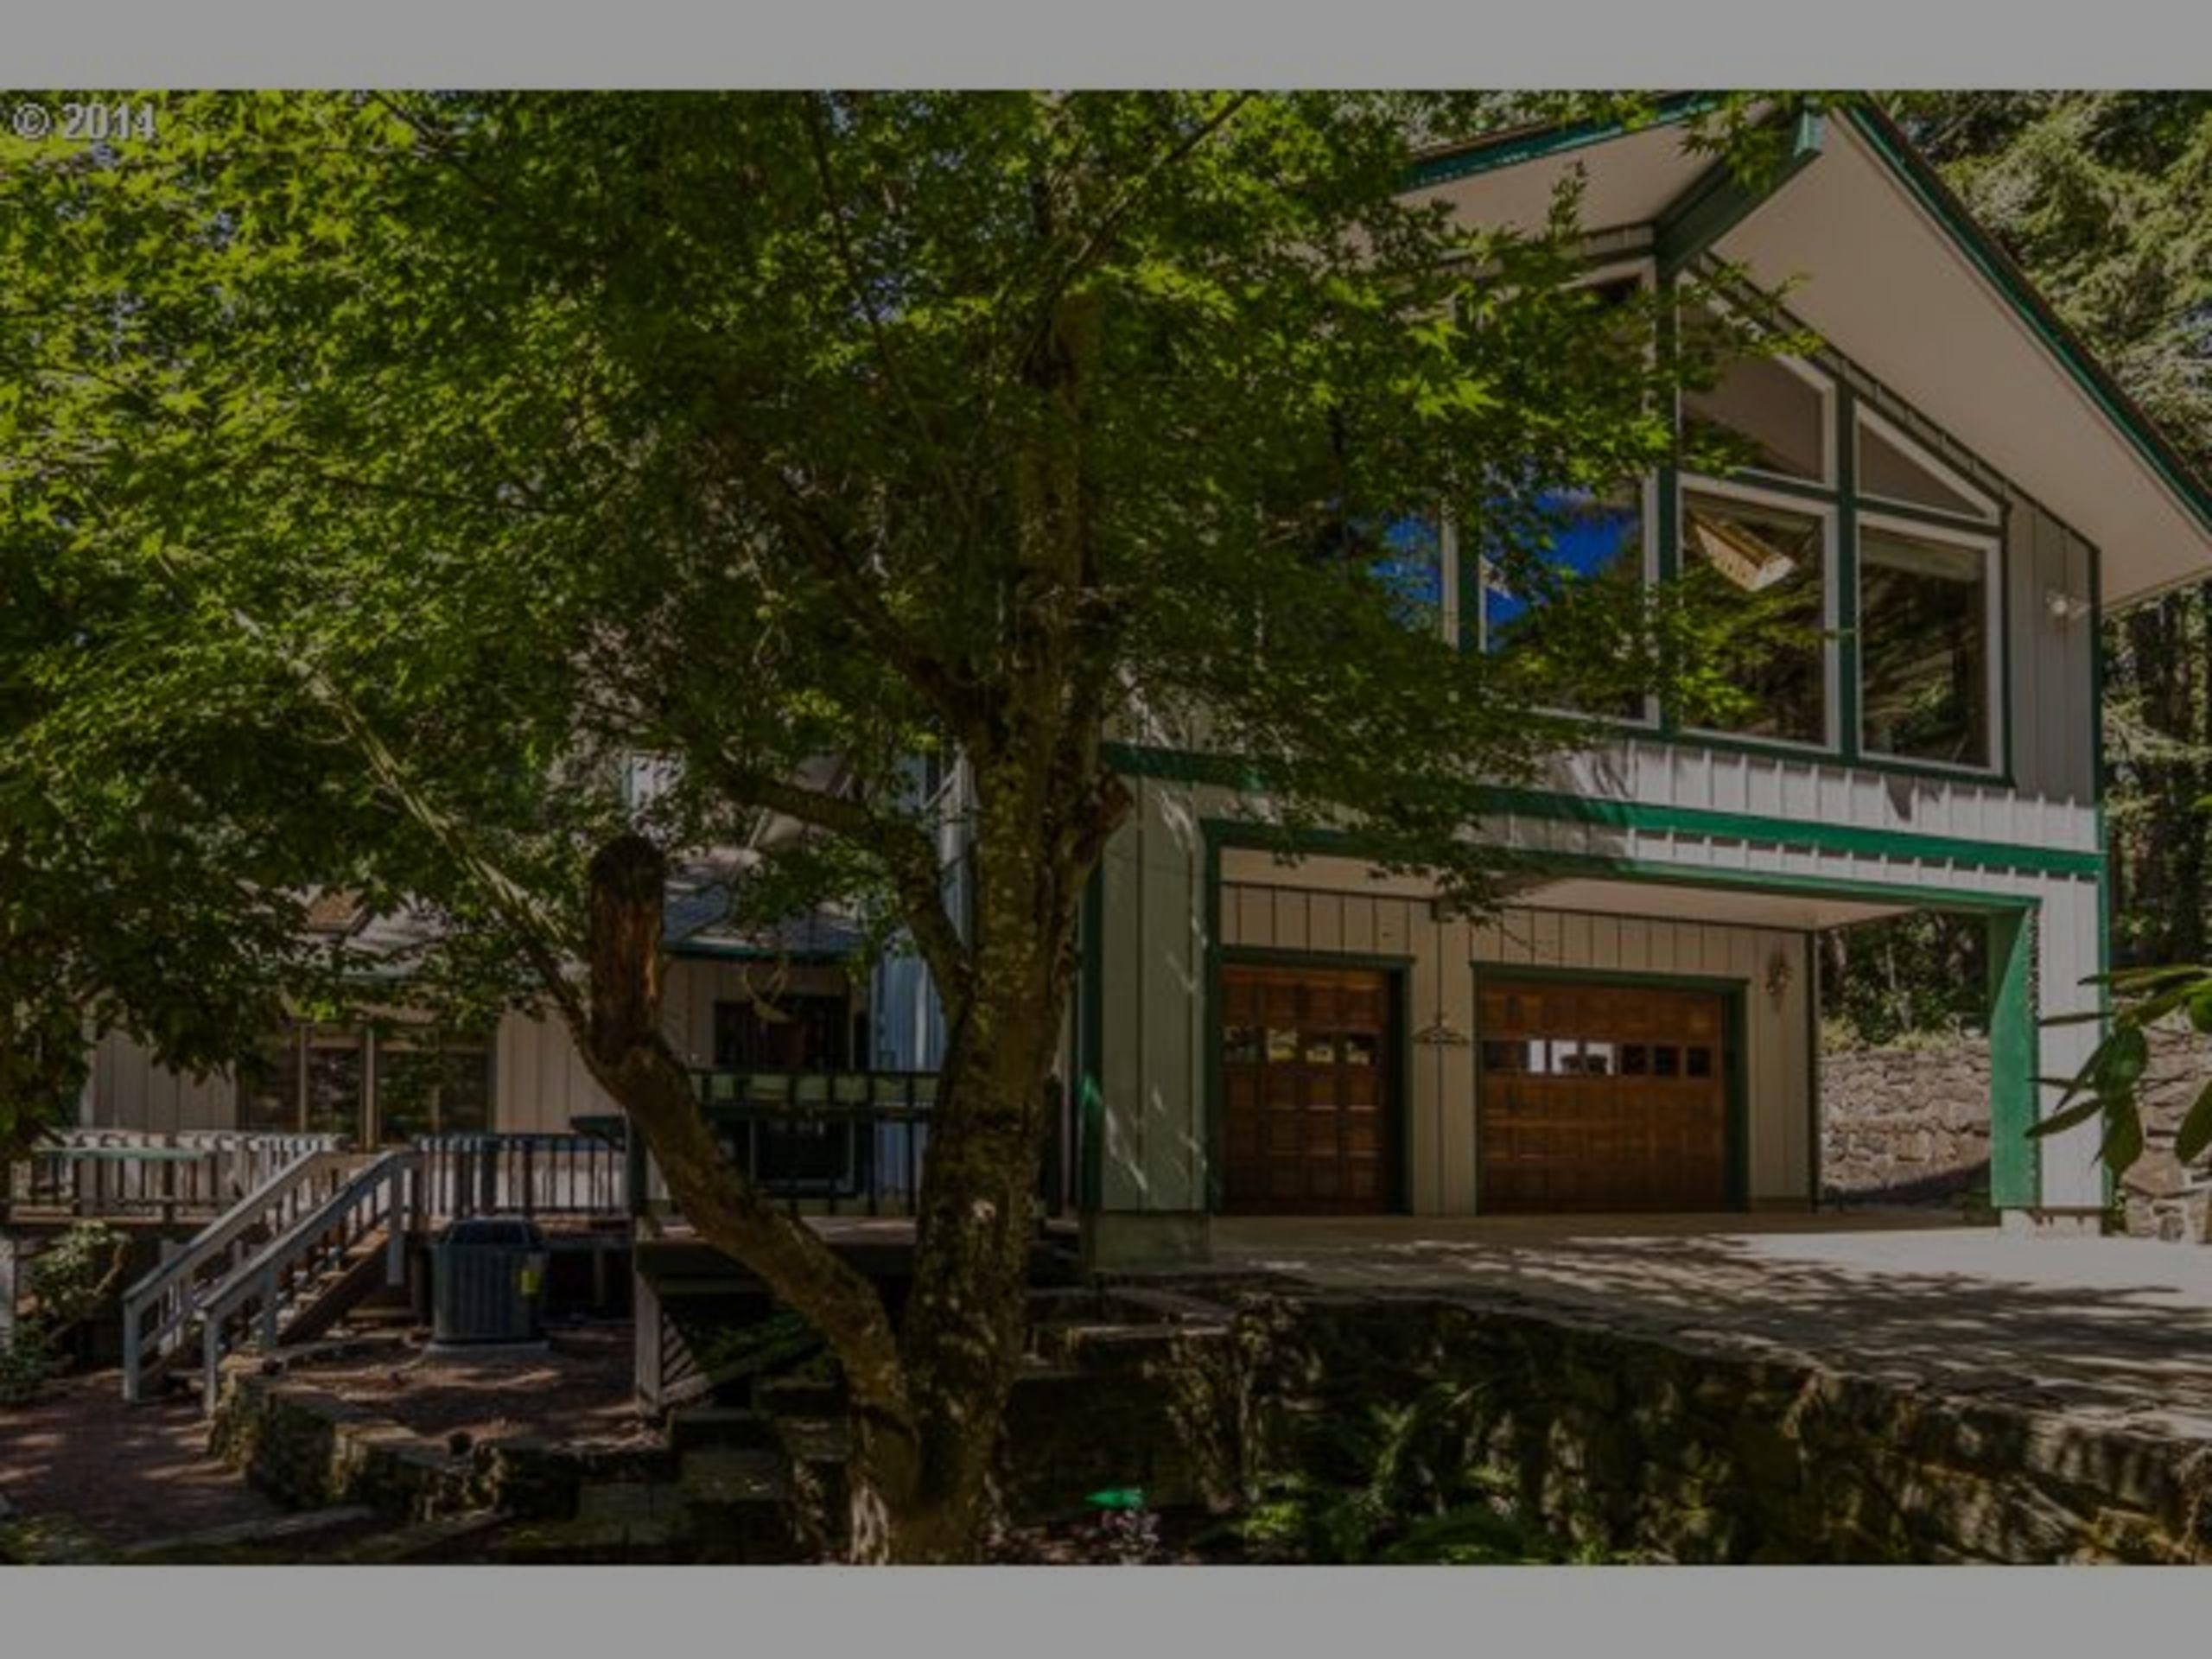 88530 PERIWINKLE RD, SPRINGFIELD, OREGON